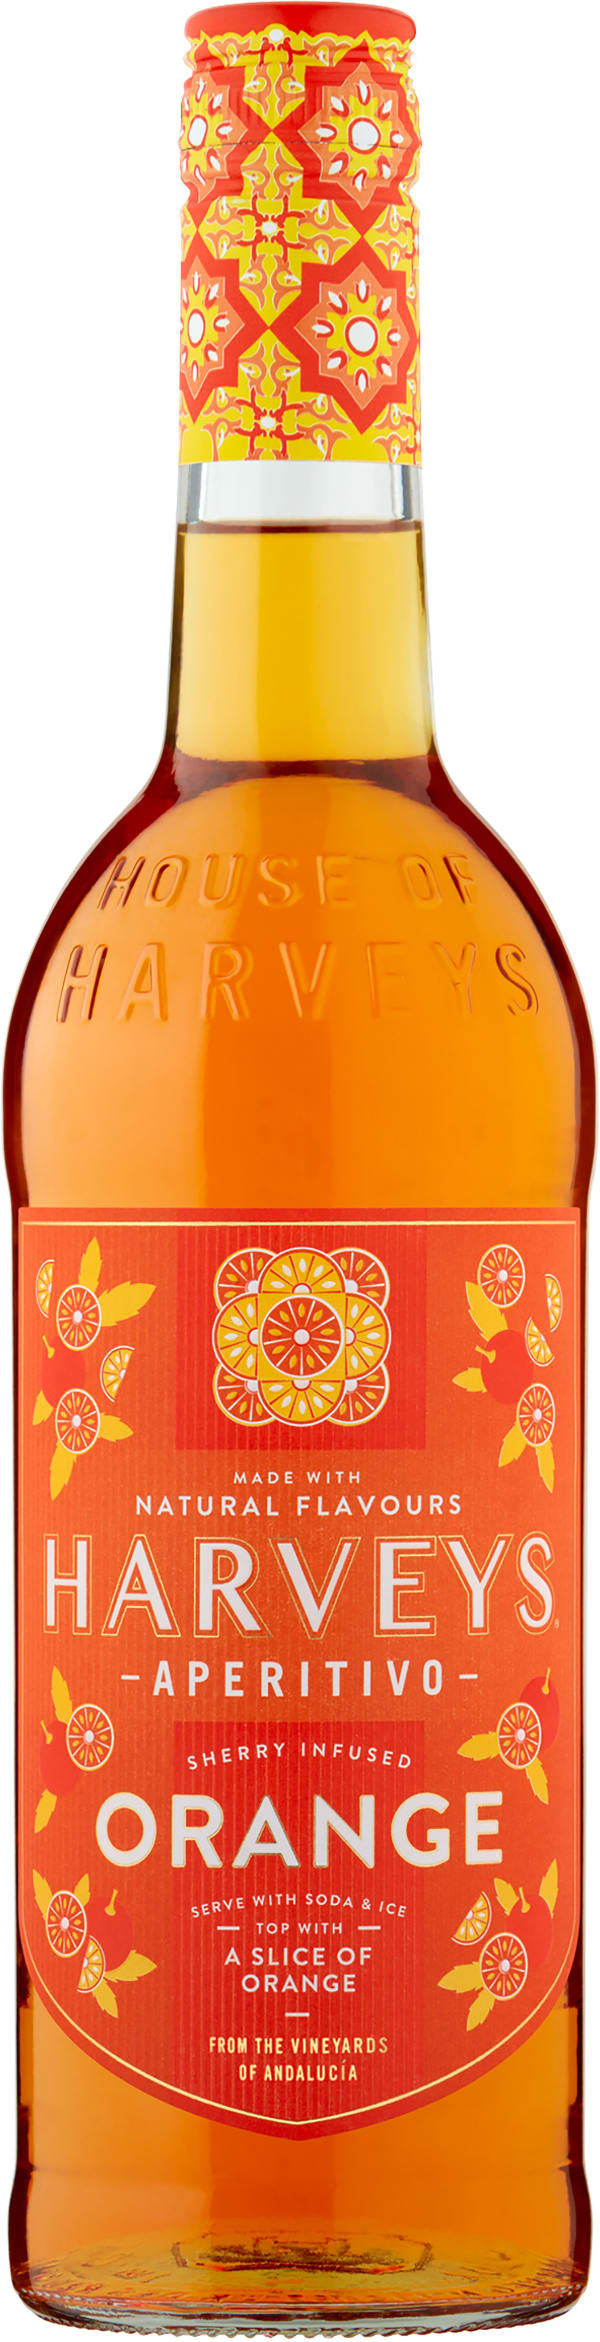 Harveys Aperitivo Orange